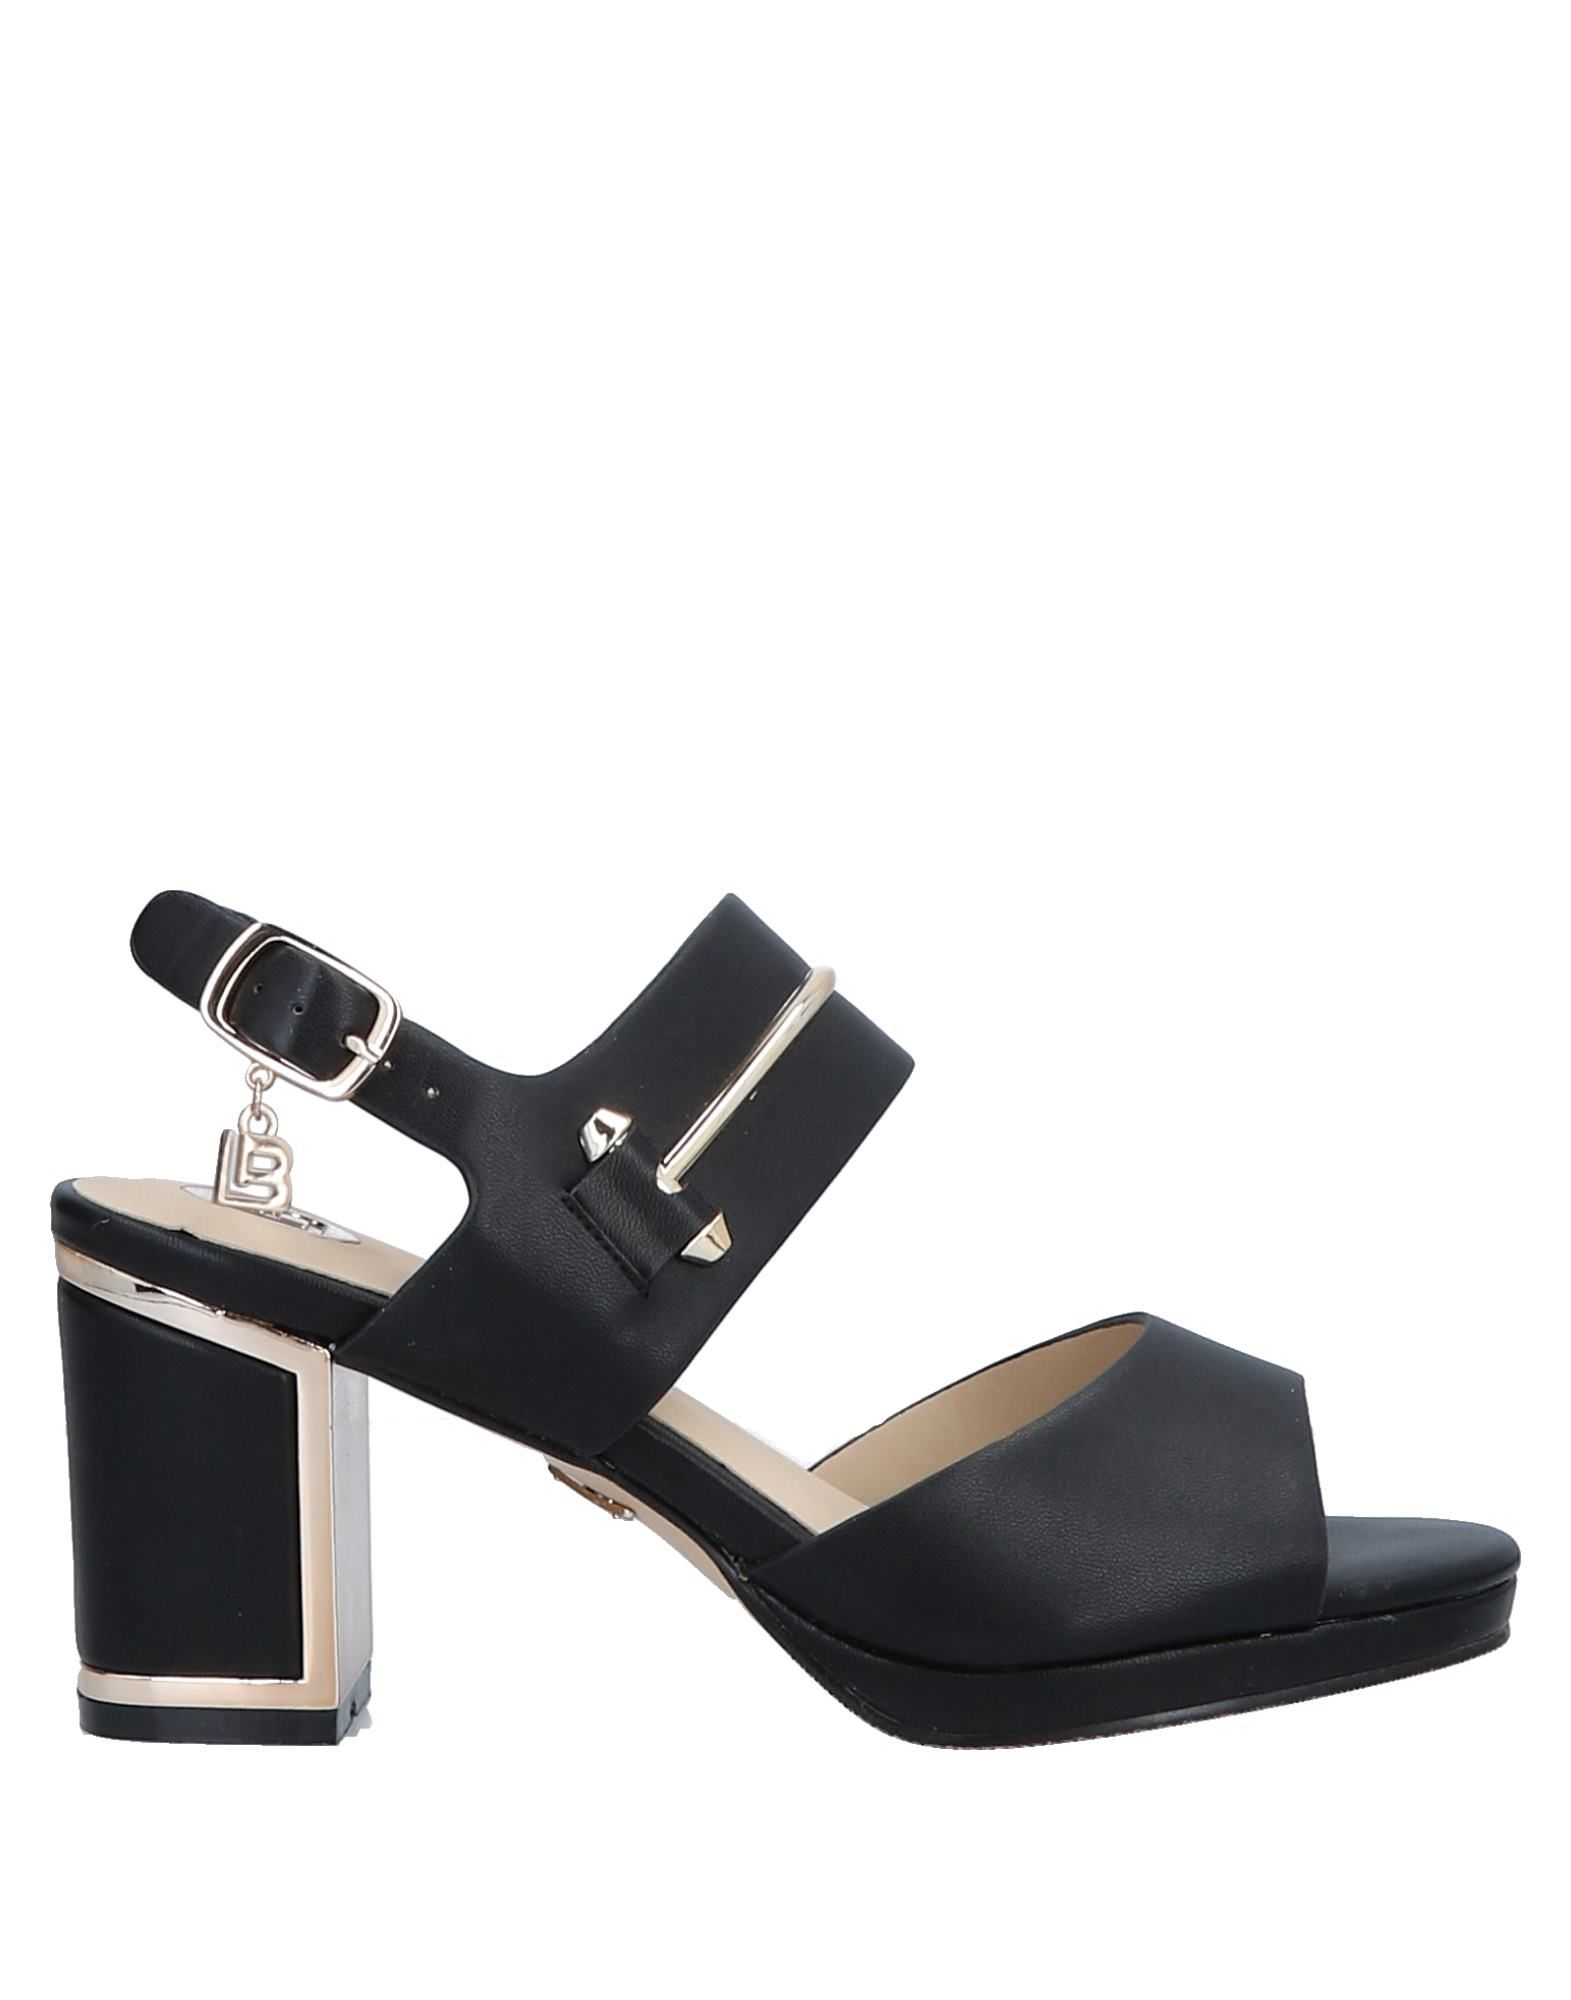 Gut um billige Damen Schuhe zu tragenLaura Biagiotti Sandalen Damen billige  11566541CS 57ac26